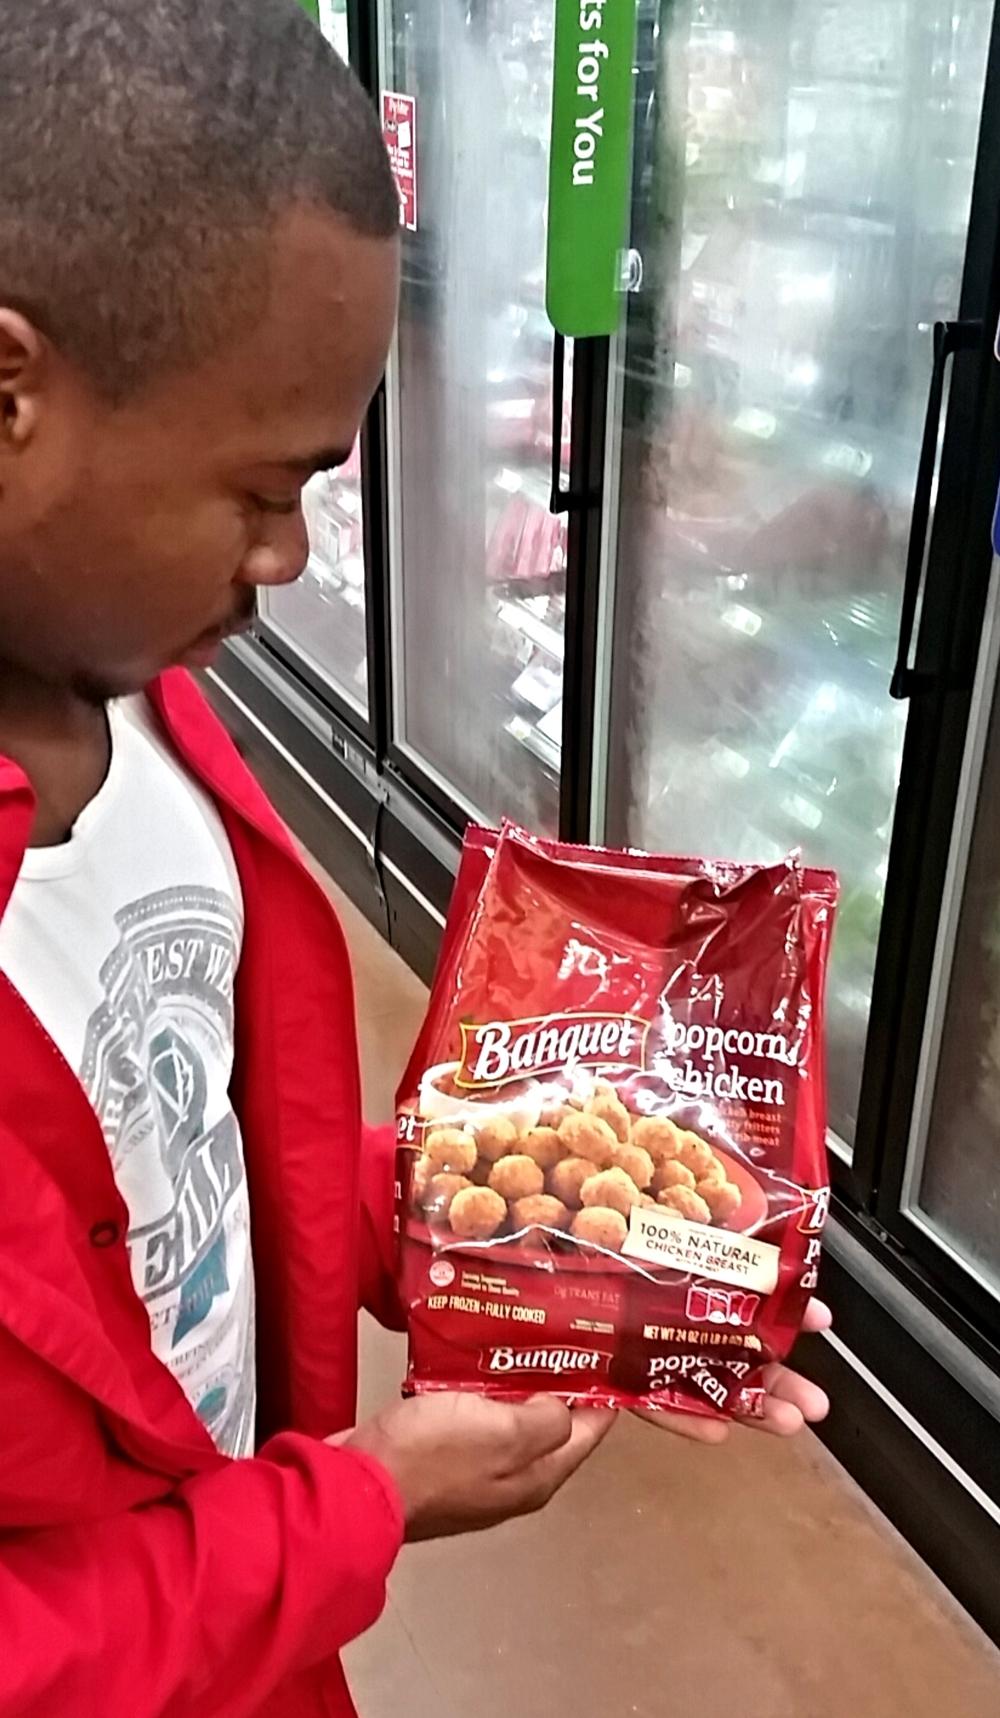 Tyler Williams contemplates popcorn chicken